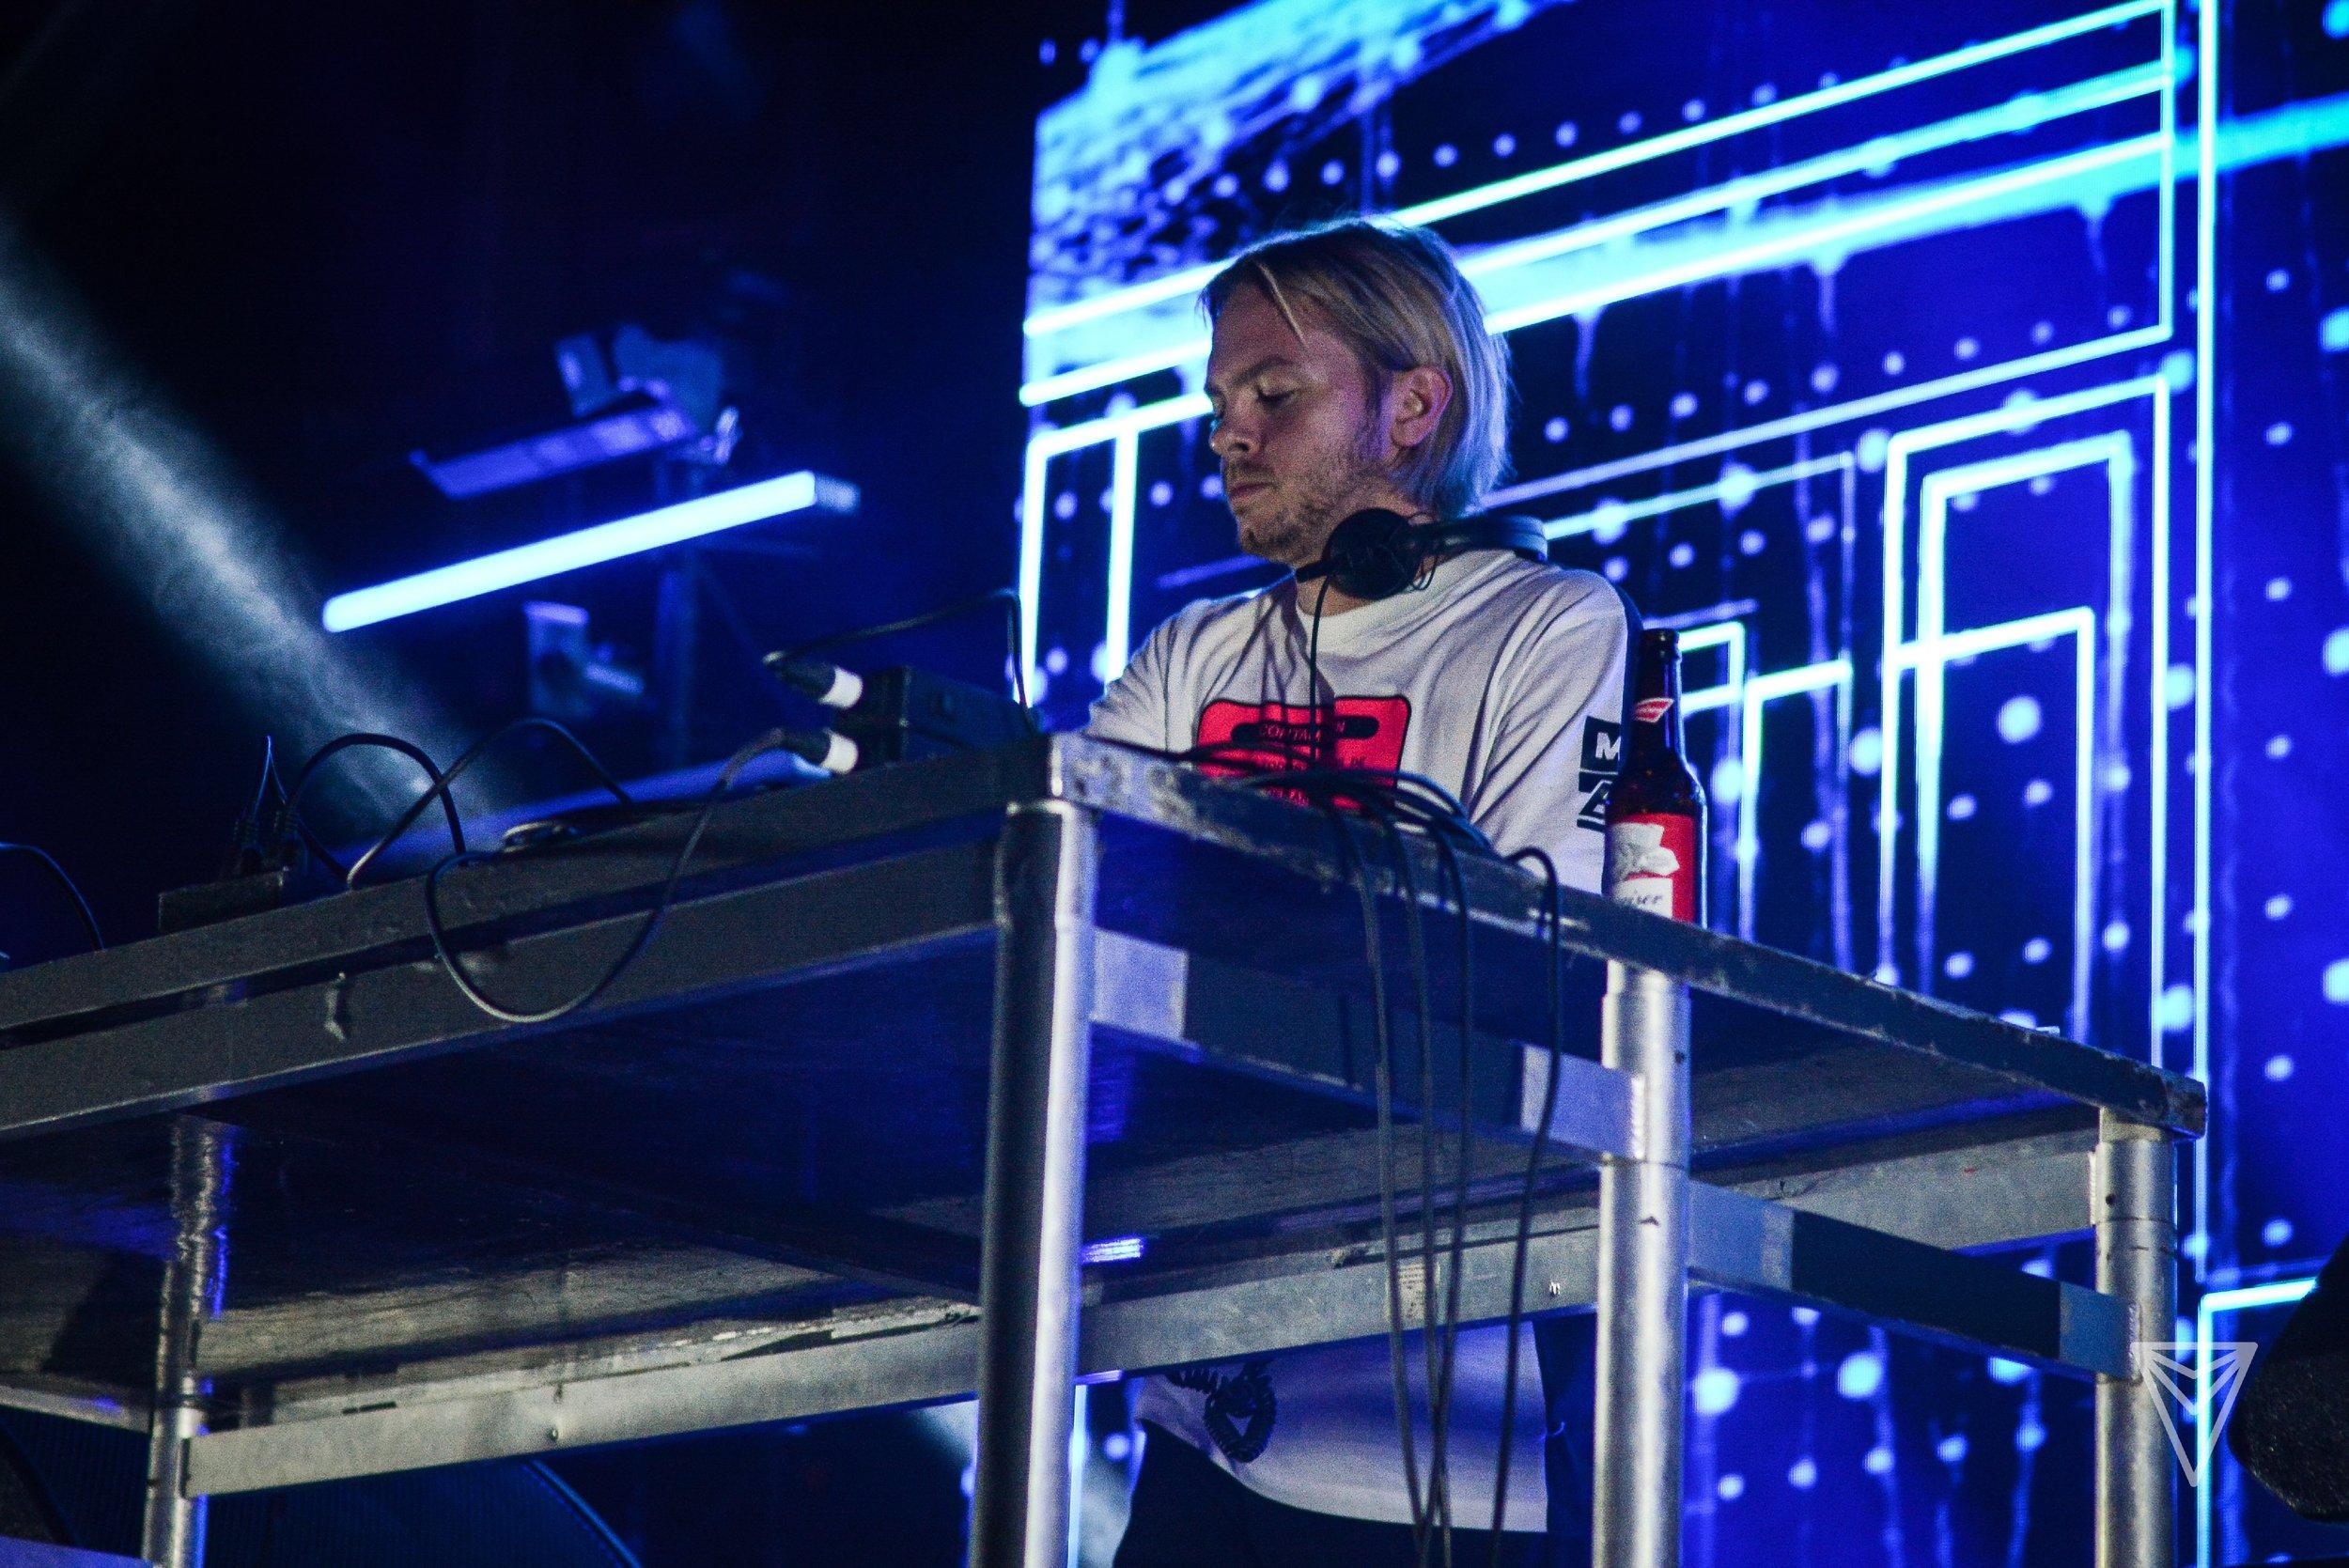 DJ SEINFIELD_SONARMEXICO (5).jpeg